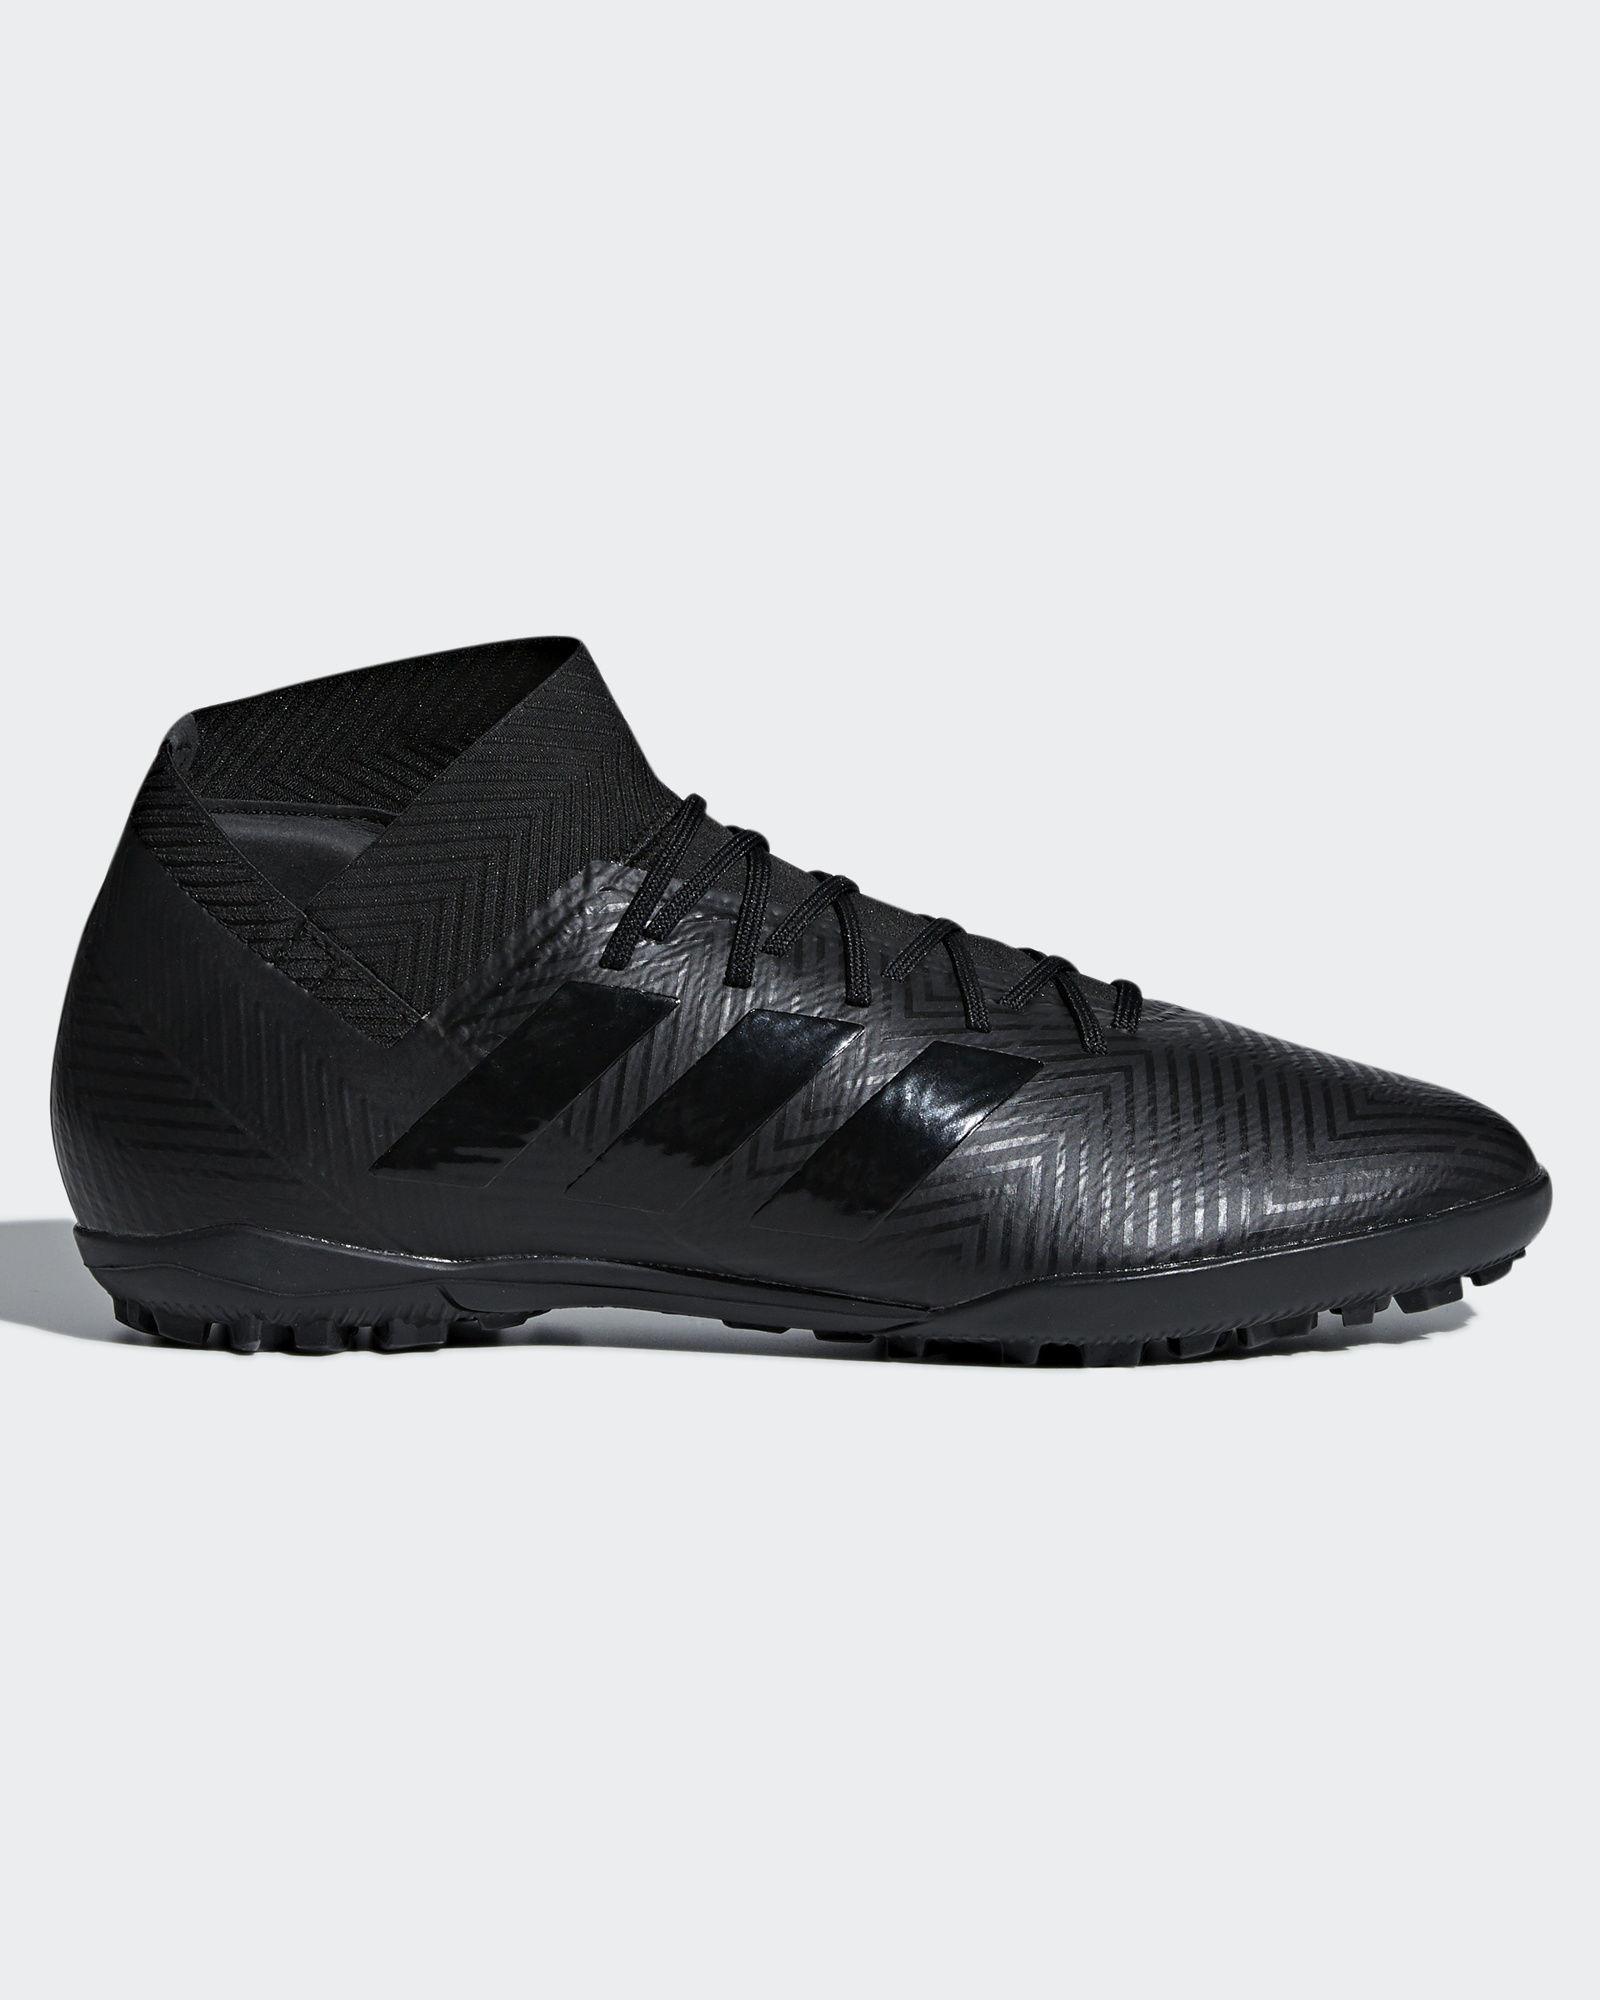 adidas Mens Nemeziz Tango 18.3 TF Football BOOTS Studs Trainers ... 53e4957a03f0a